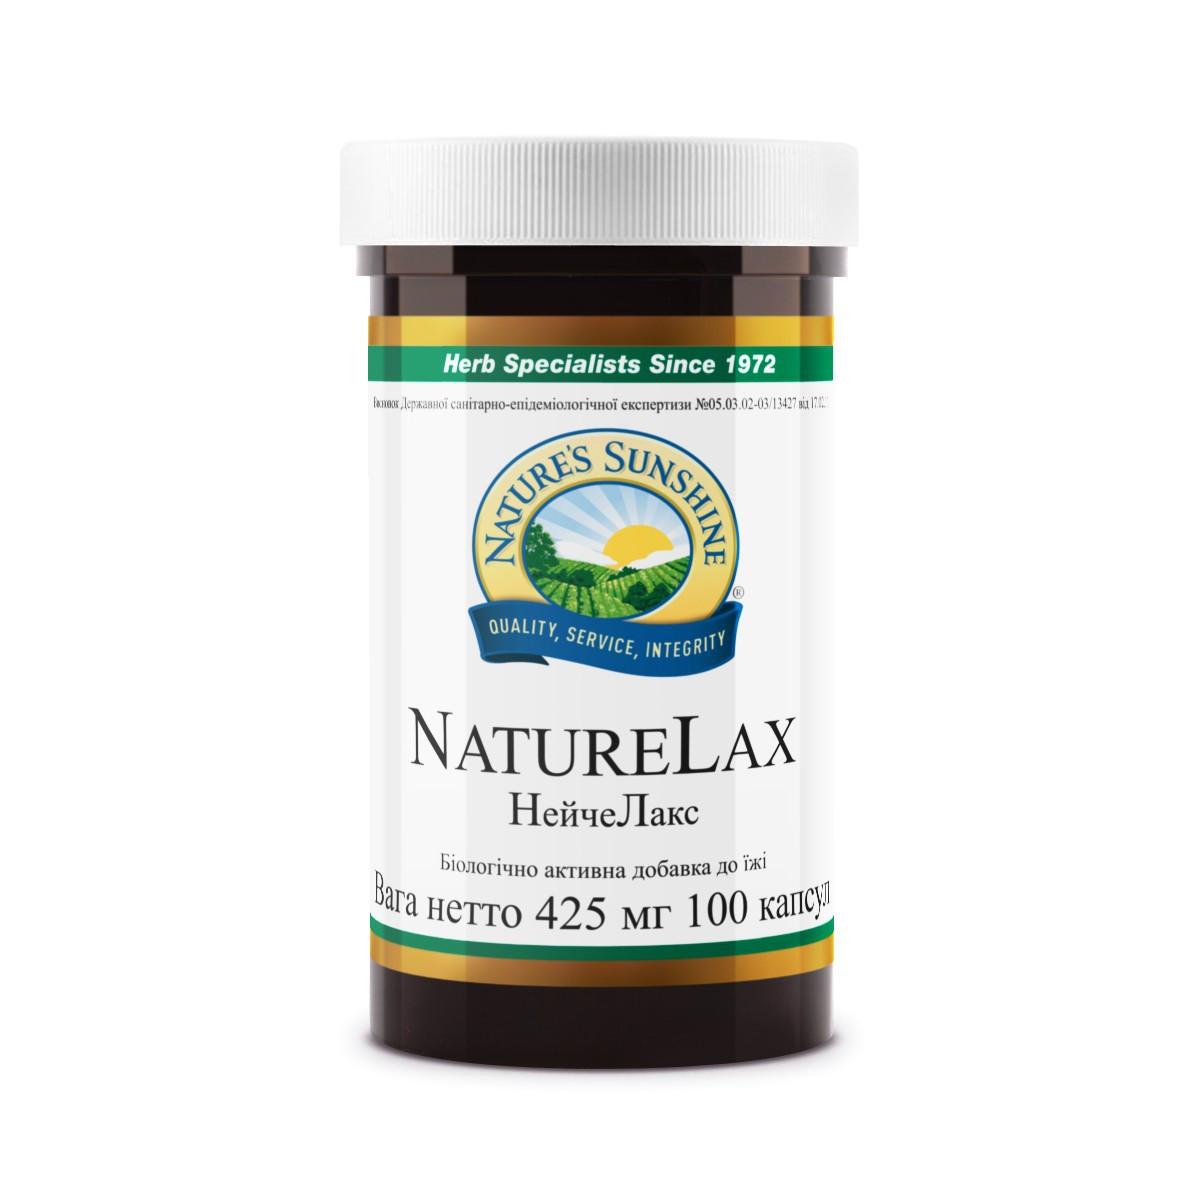 Nature Lax Нэйче Лакс, НСП, NSP, США. Натуральний продукт для здорової роботи кишечника!